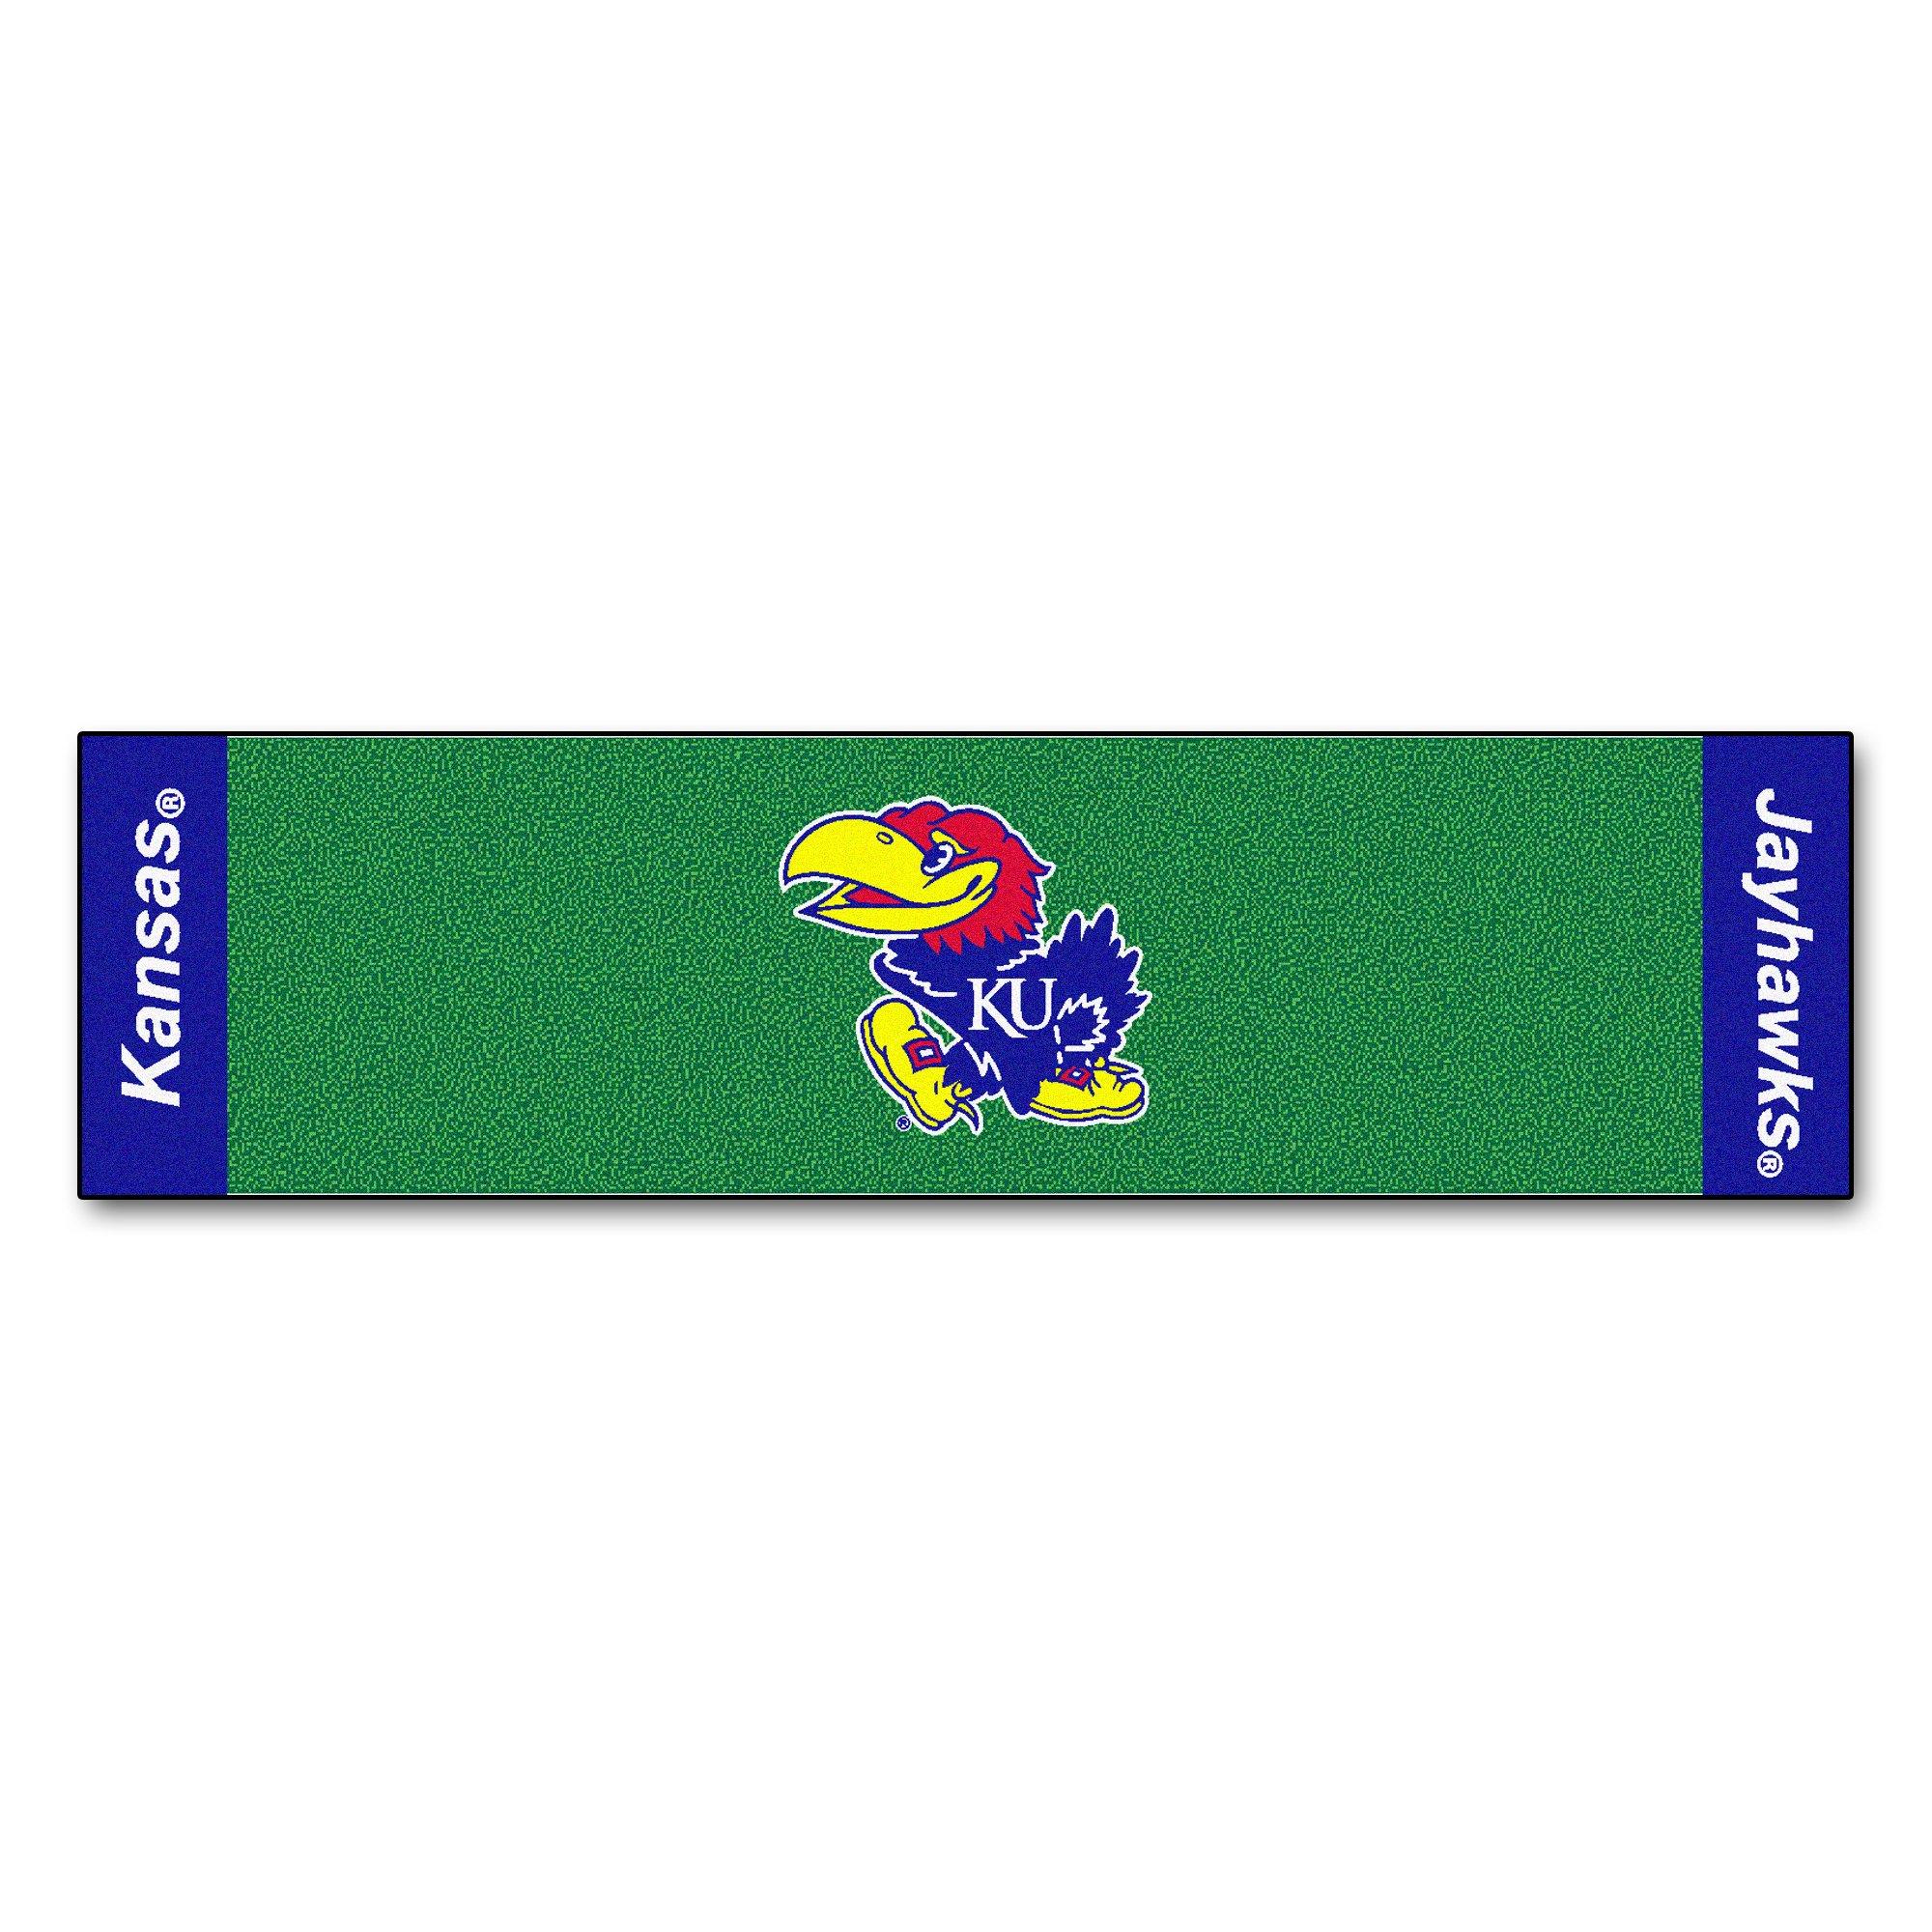 NCAA Kansas Jayhawks Golf Practice Putting Green Rug Runner 18'' x 72''